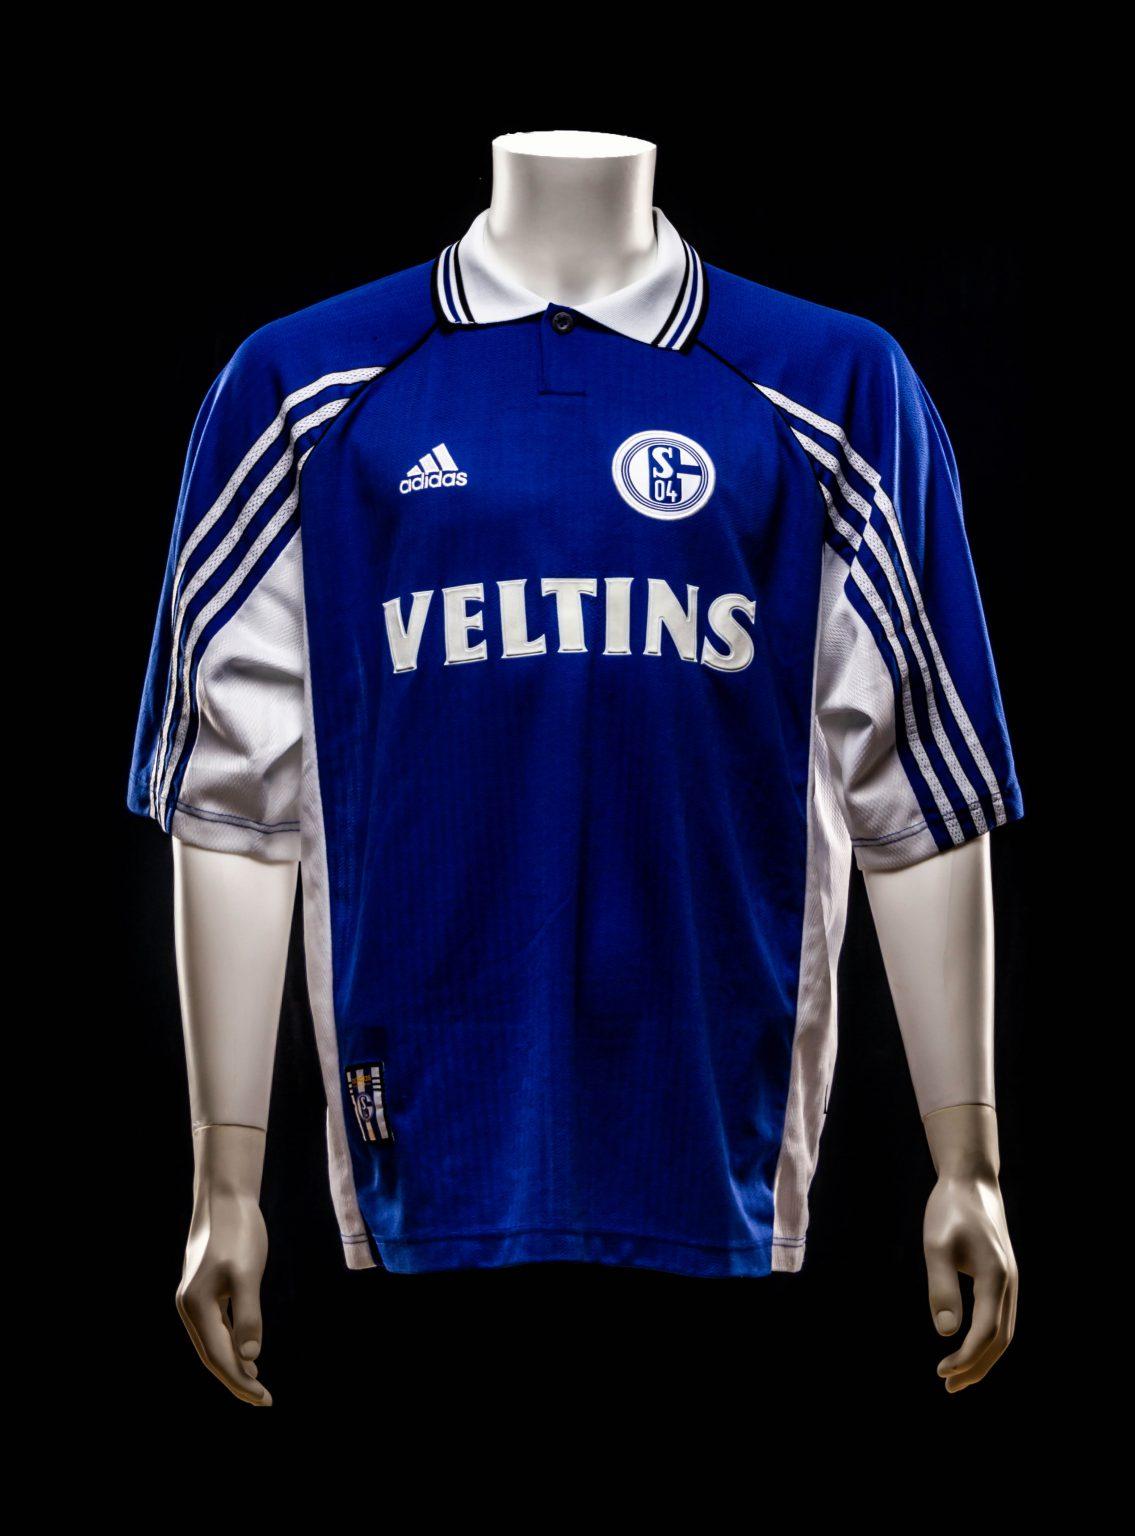 # Schalke04